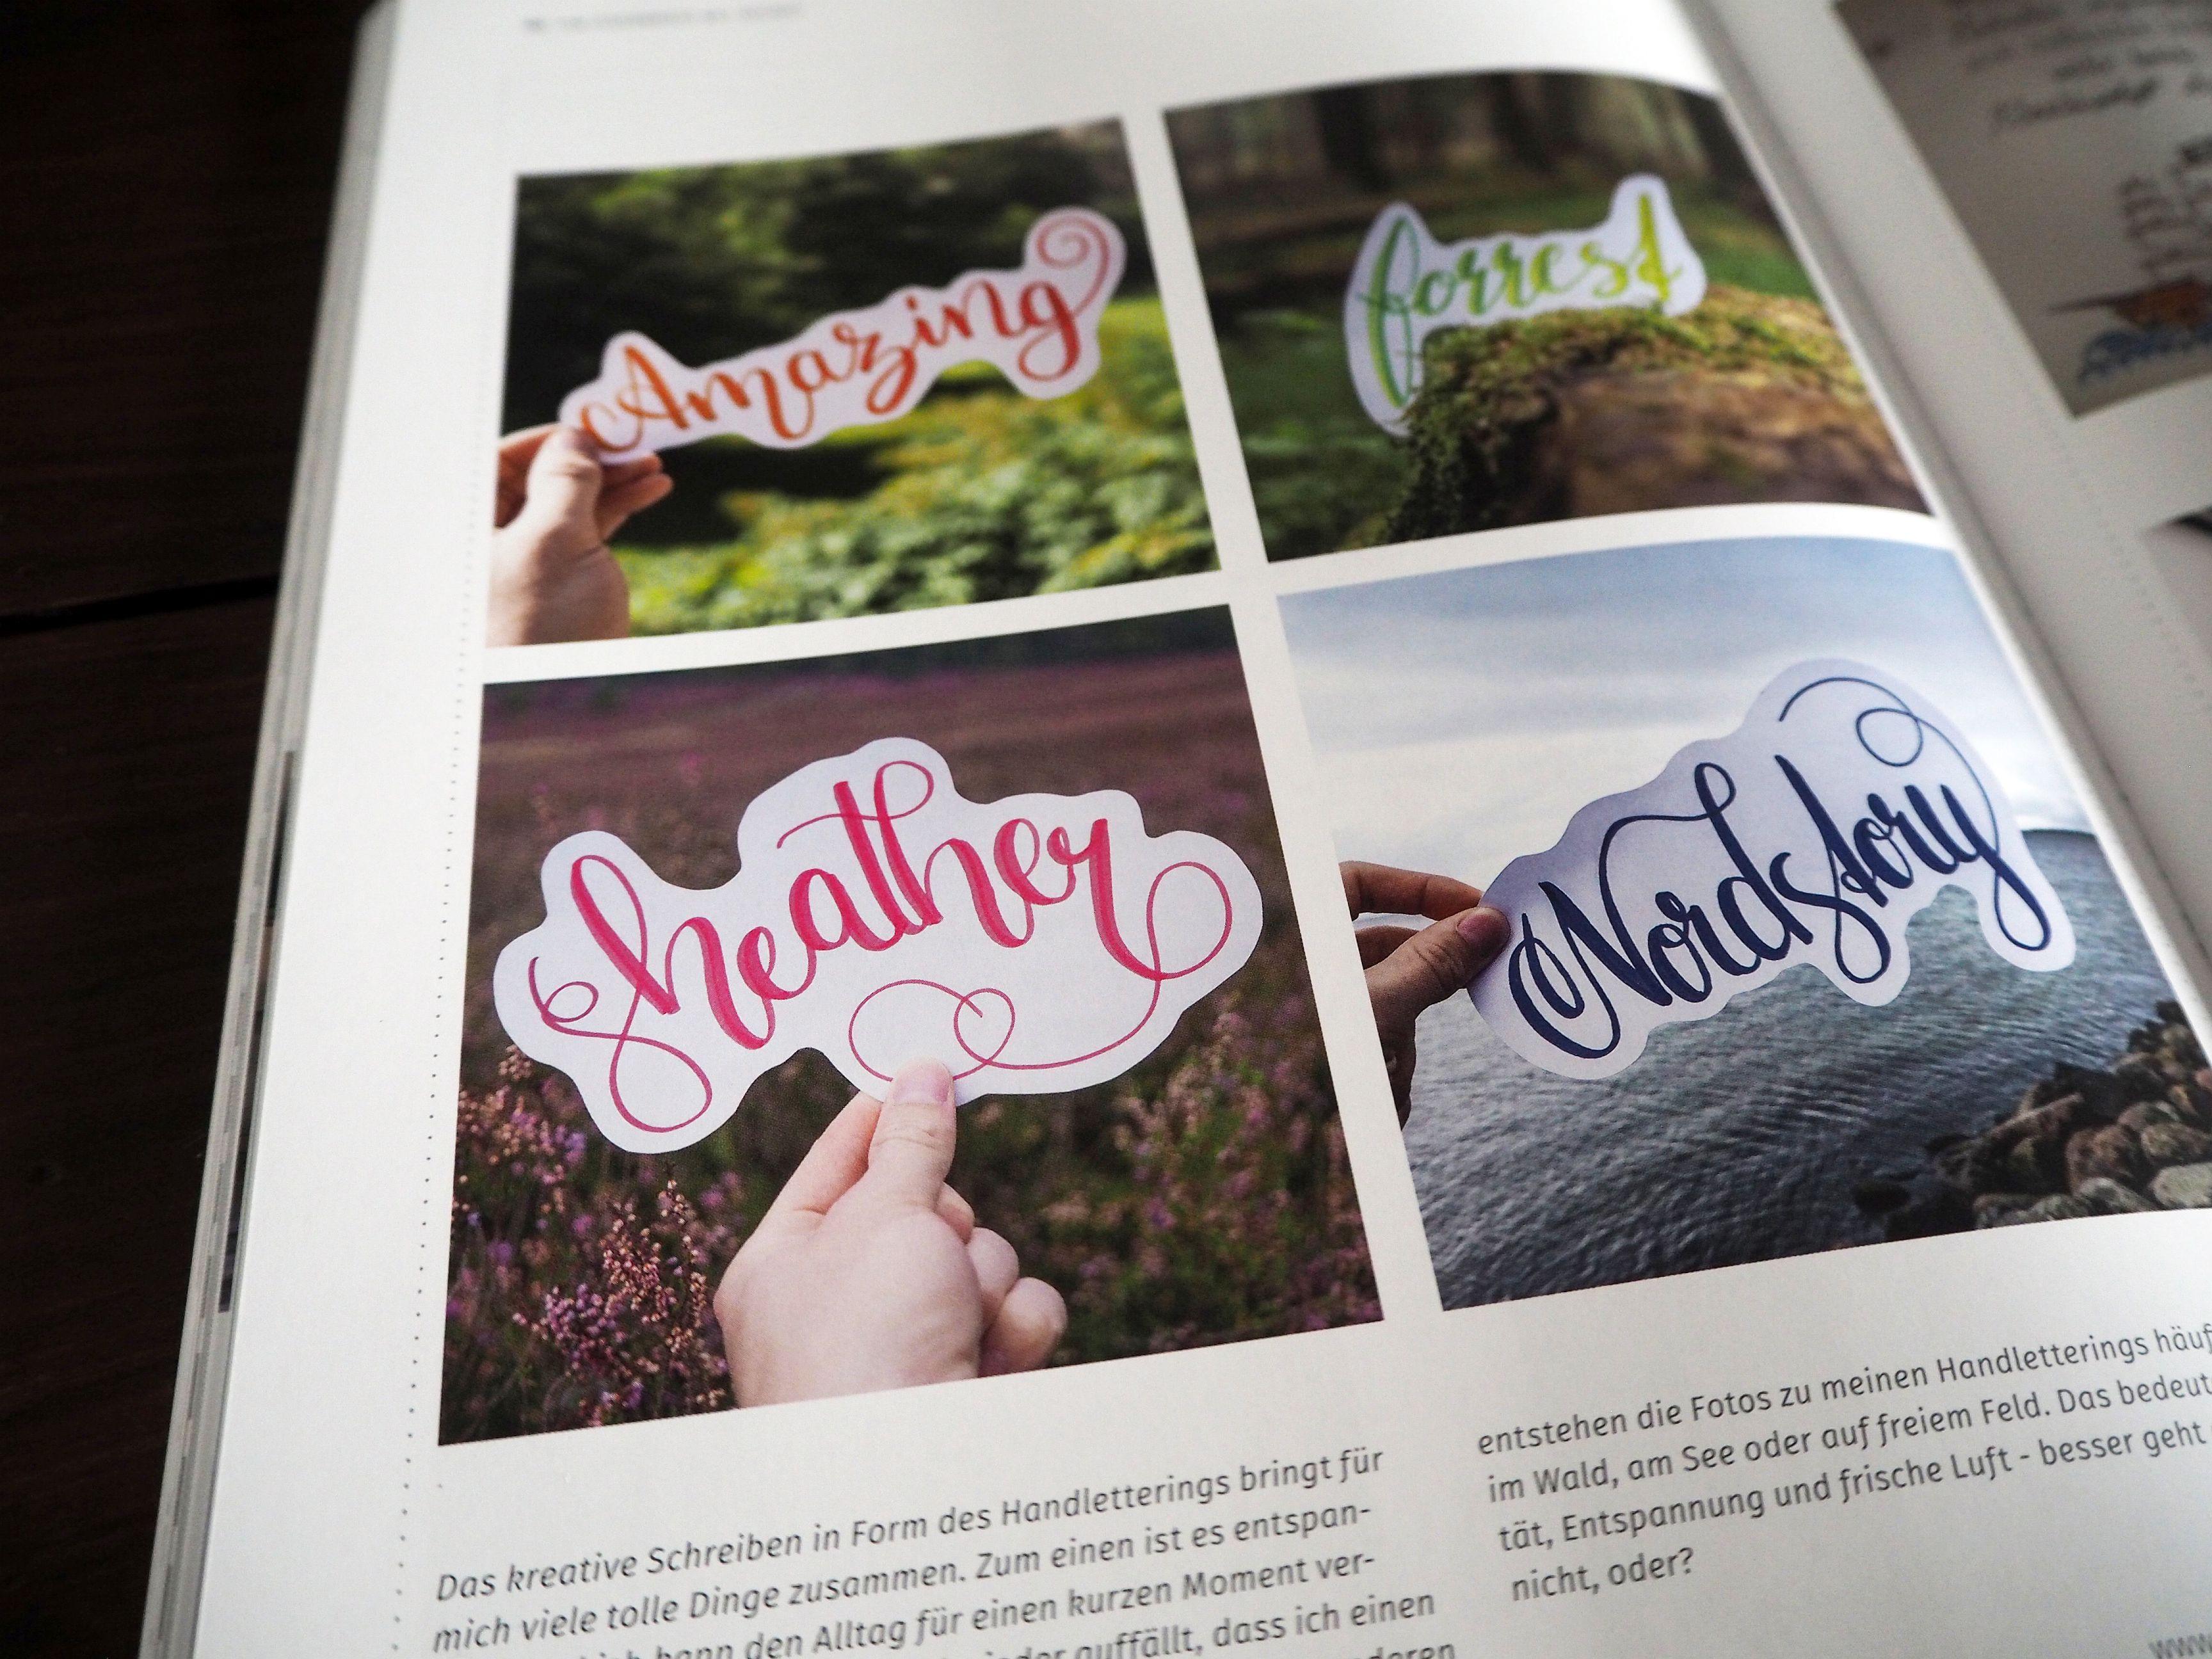 2017-12-skoen-och-kreativ-sonntagslektuere-zeitschrift-kalligrafie-aktuell (19)